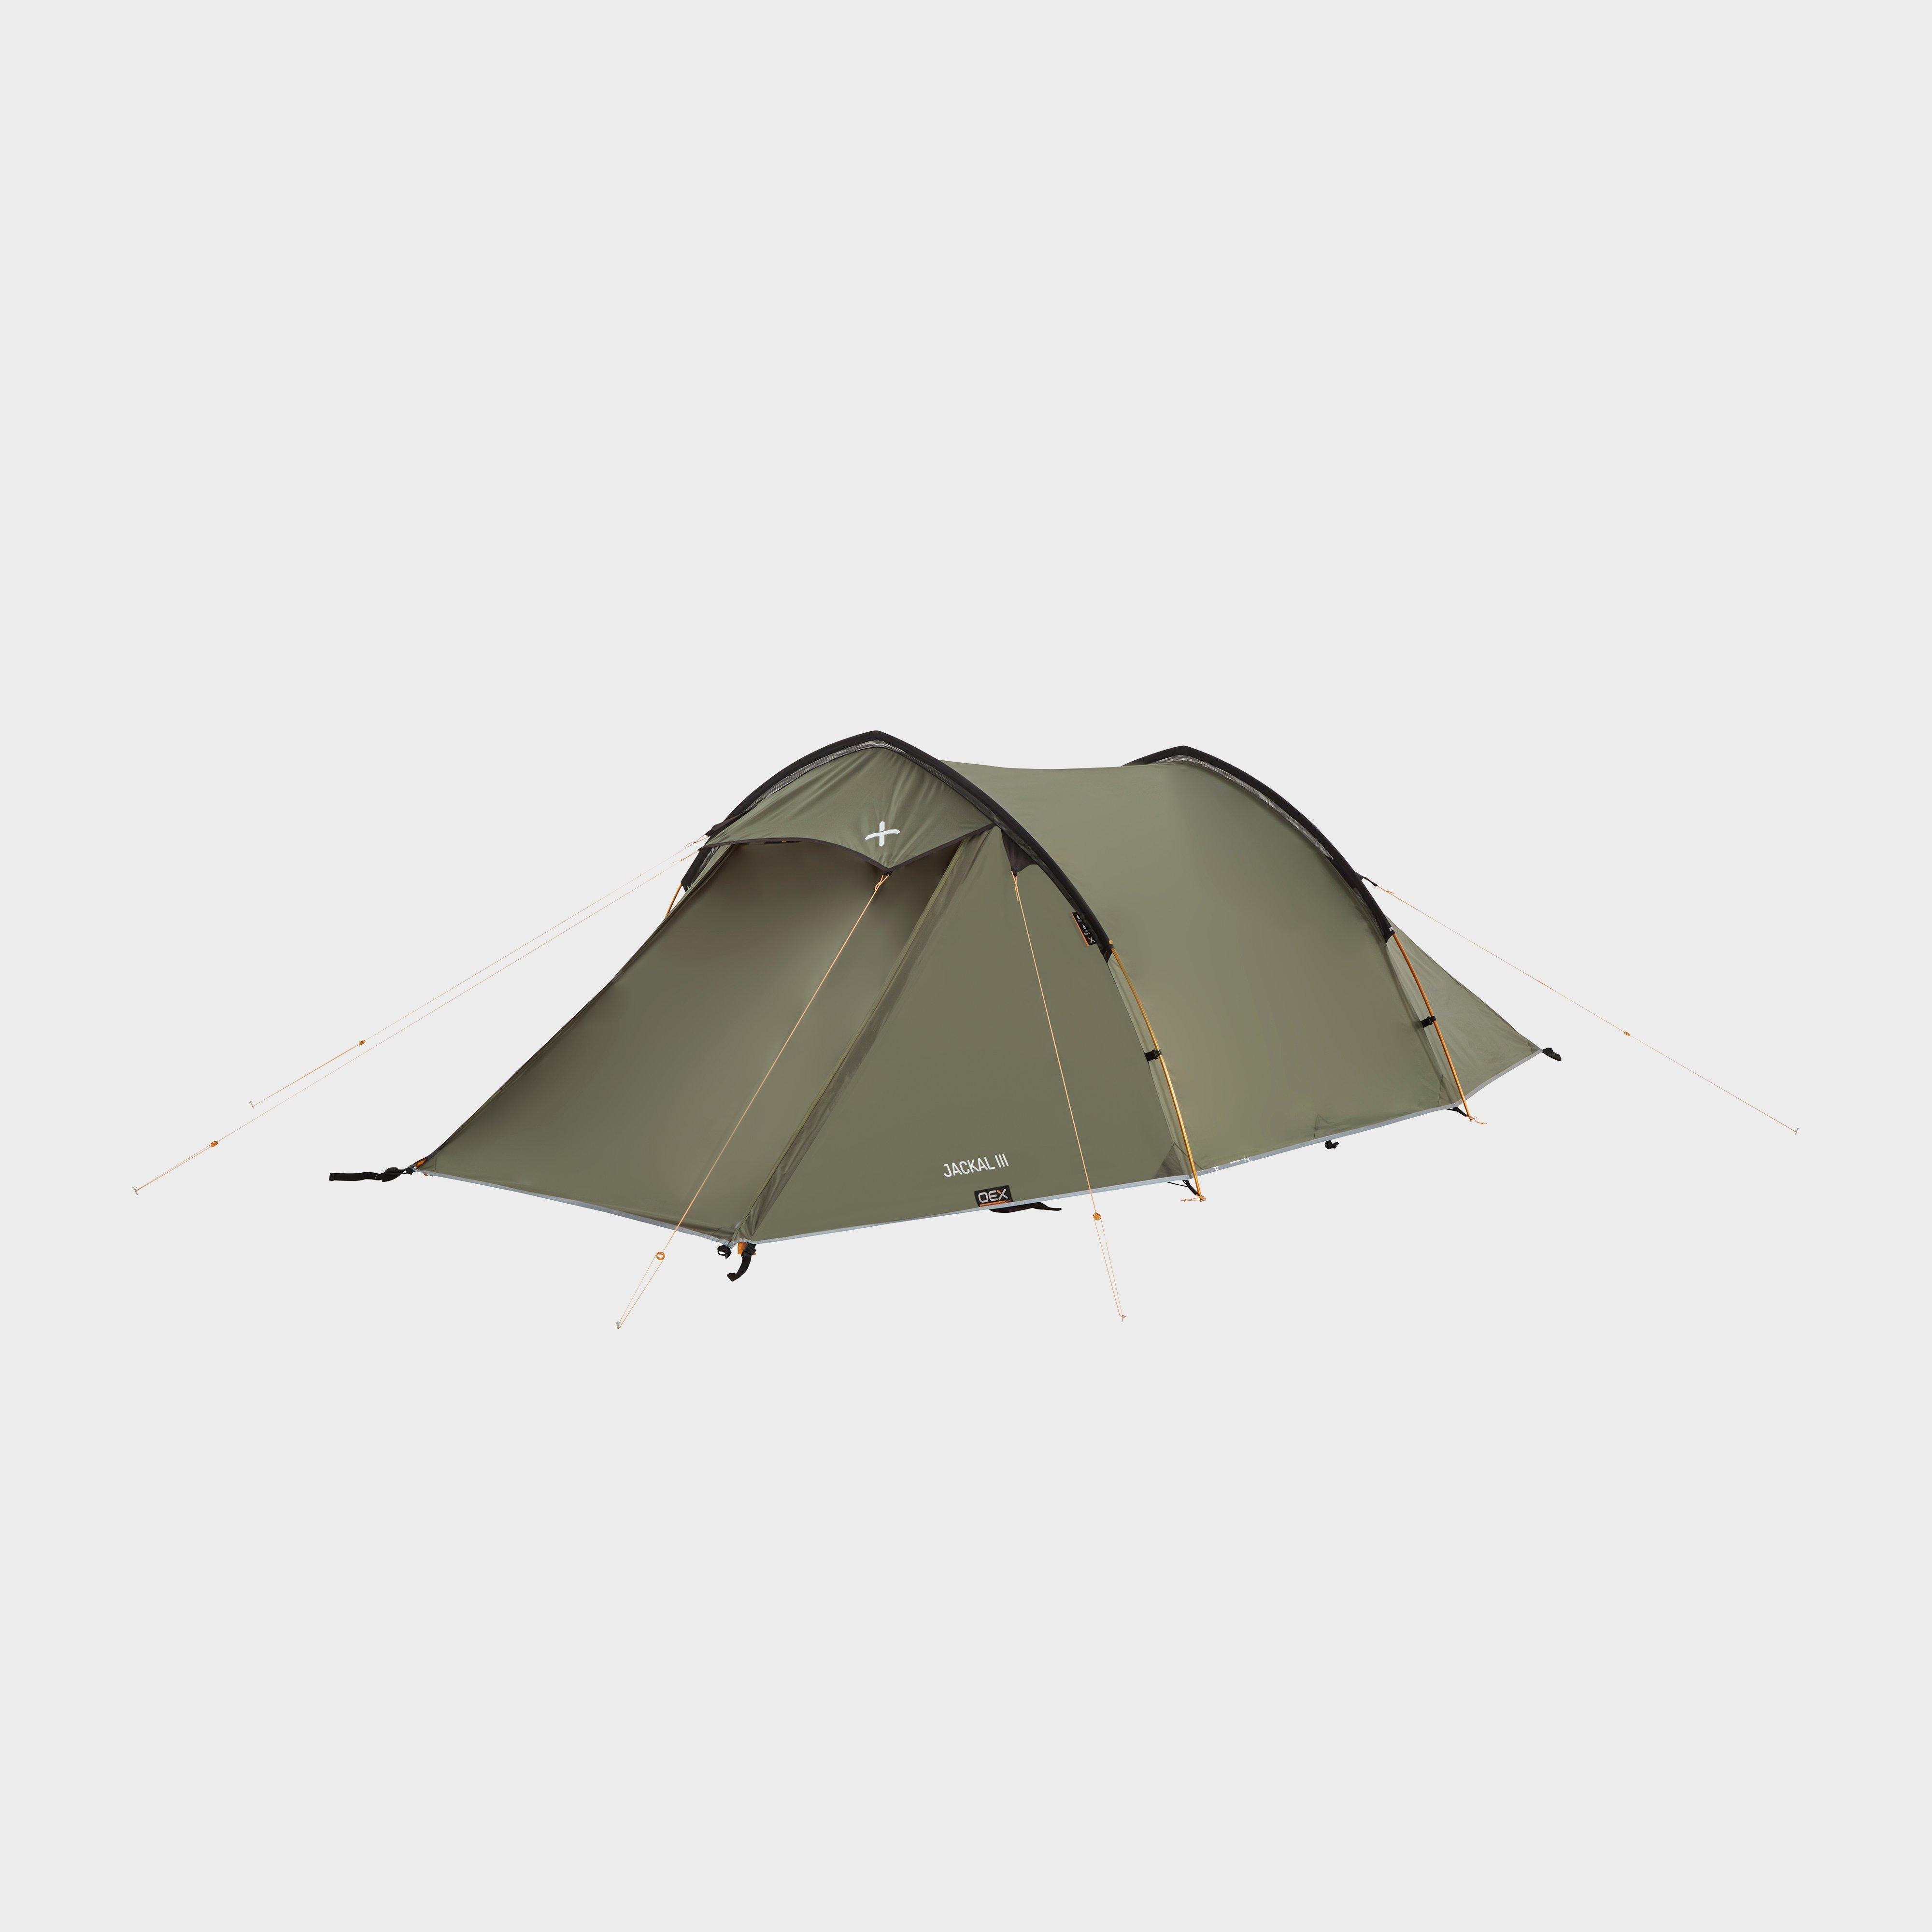 Oex Oex Jackal 3 Tent, Olive